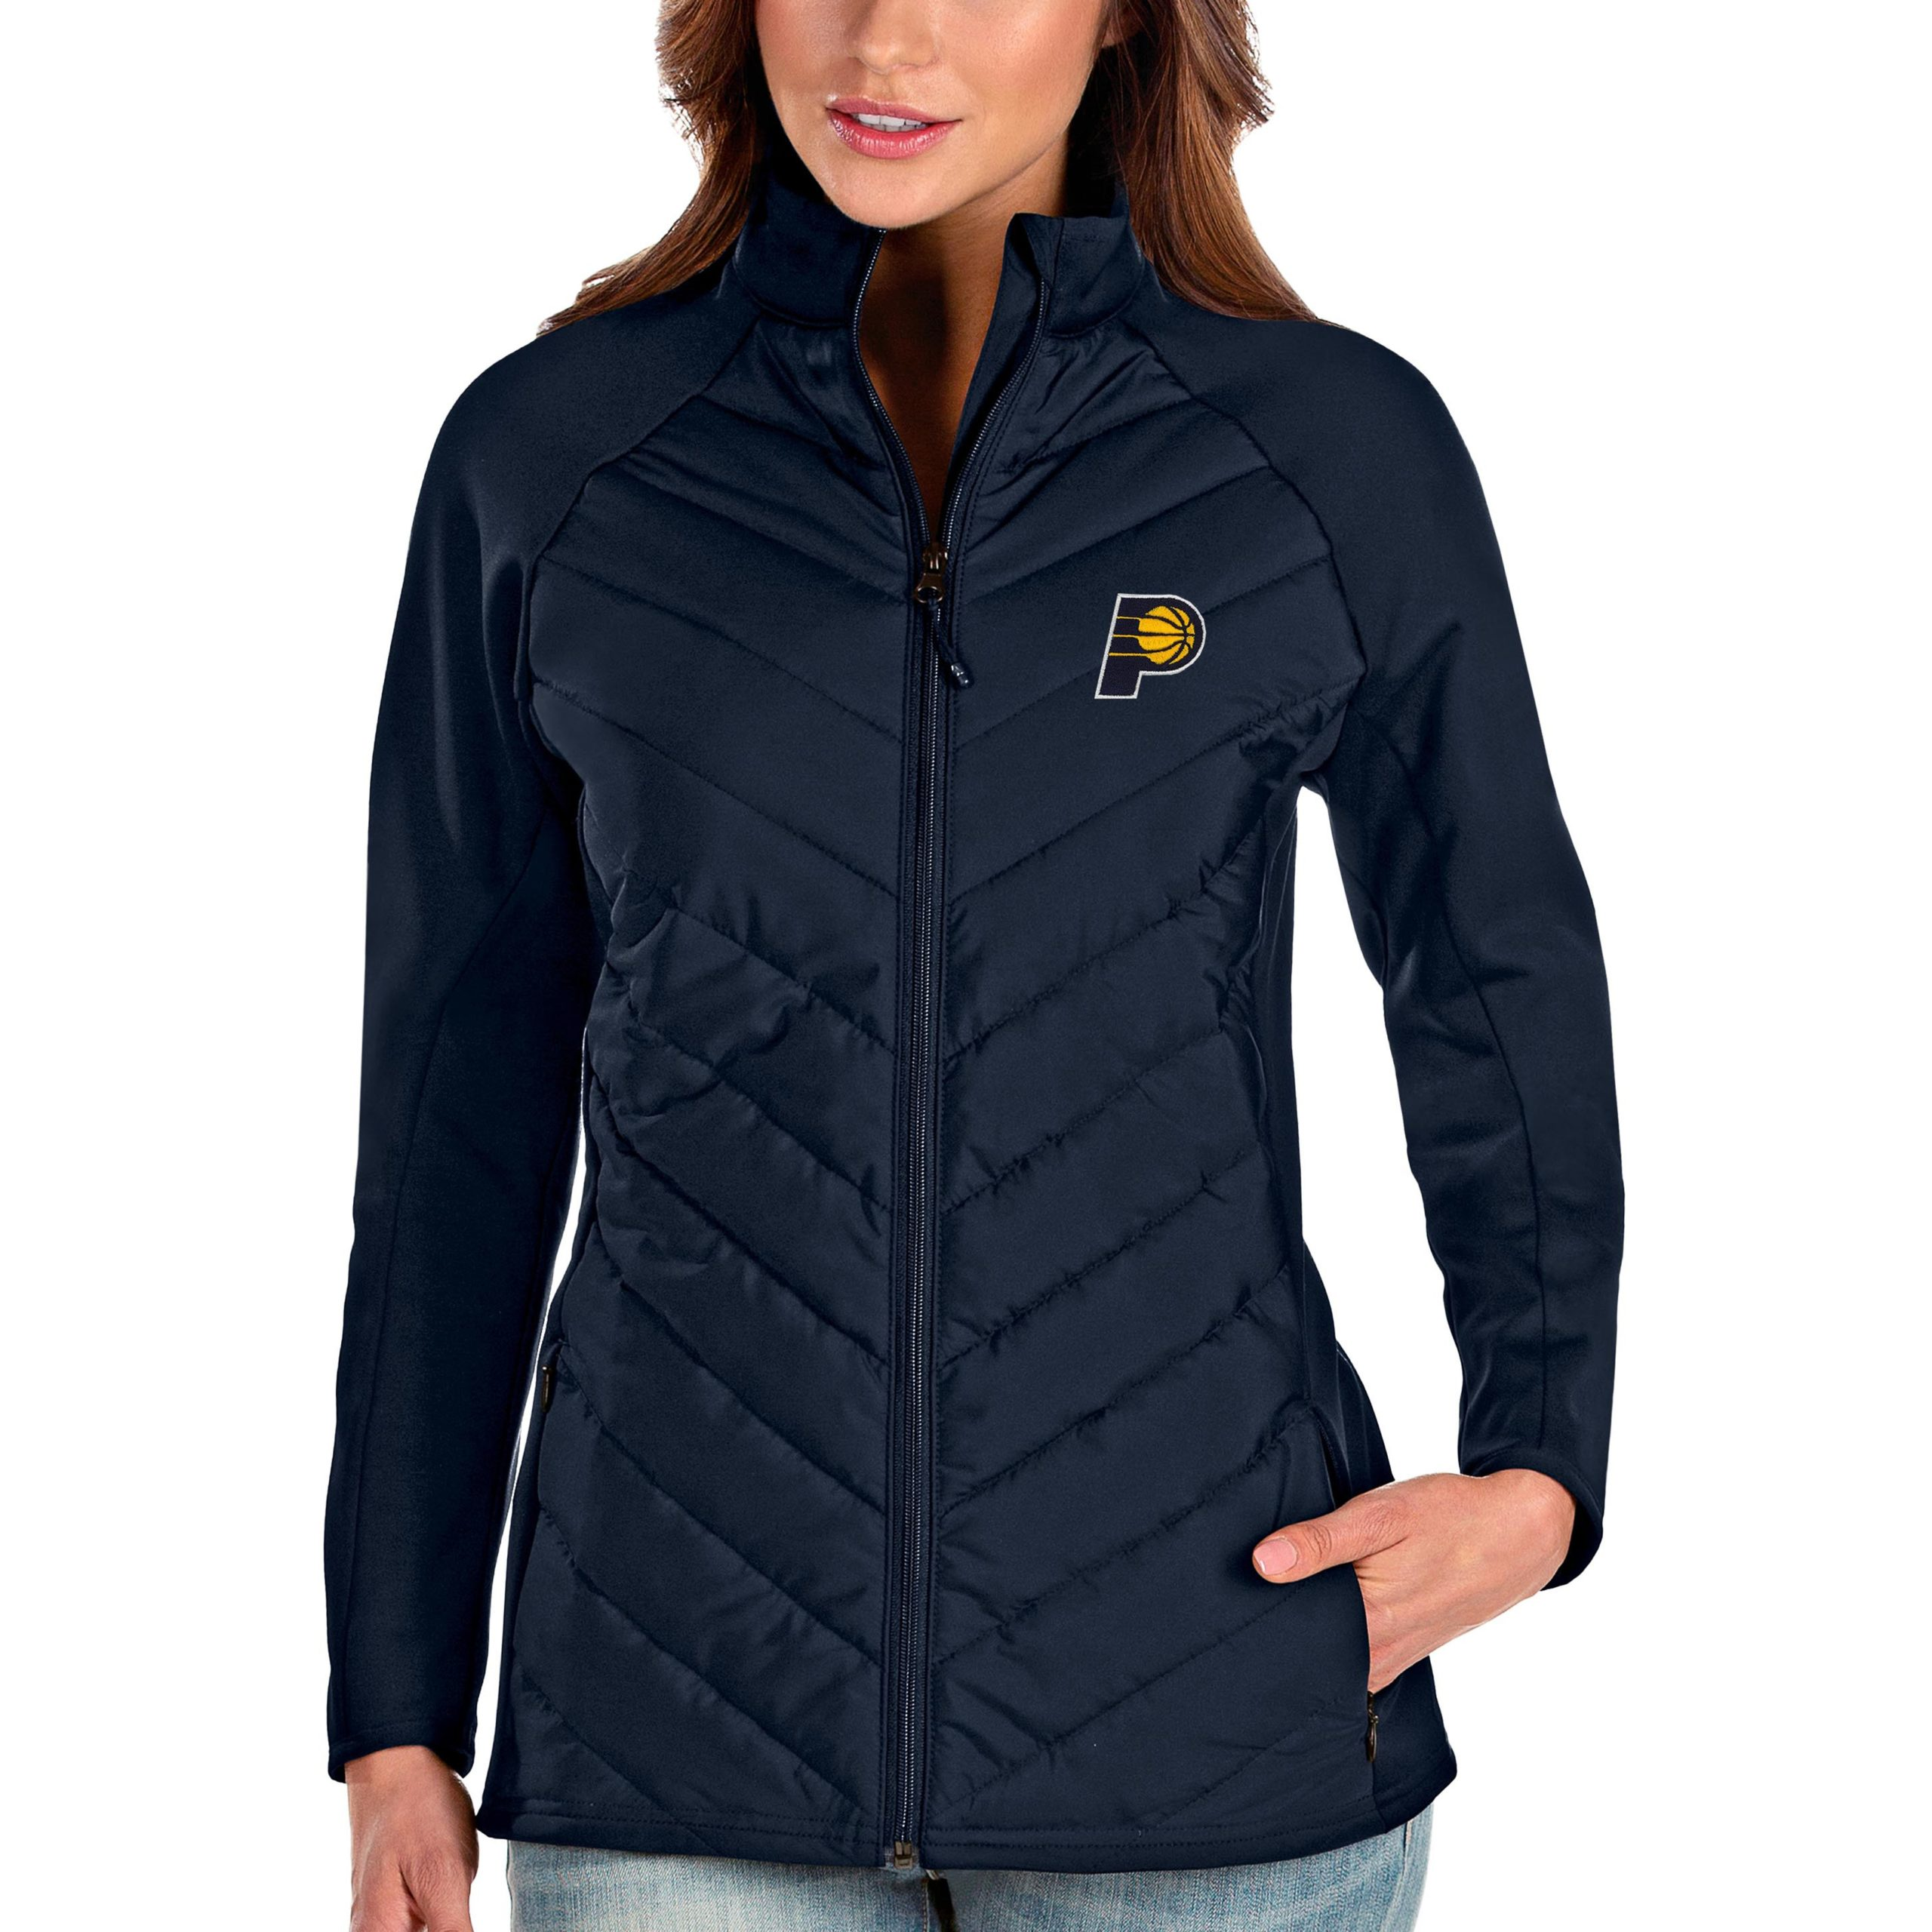 Indiana Pacers Antigua Women's Altitude Full-Zip Jacket - Navy